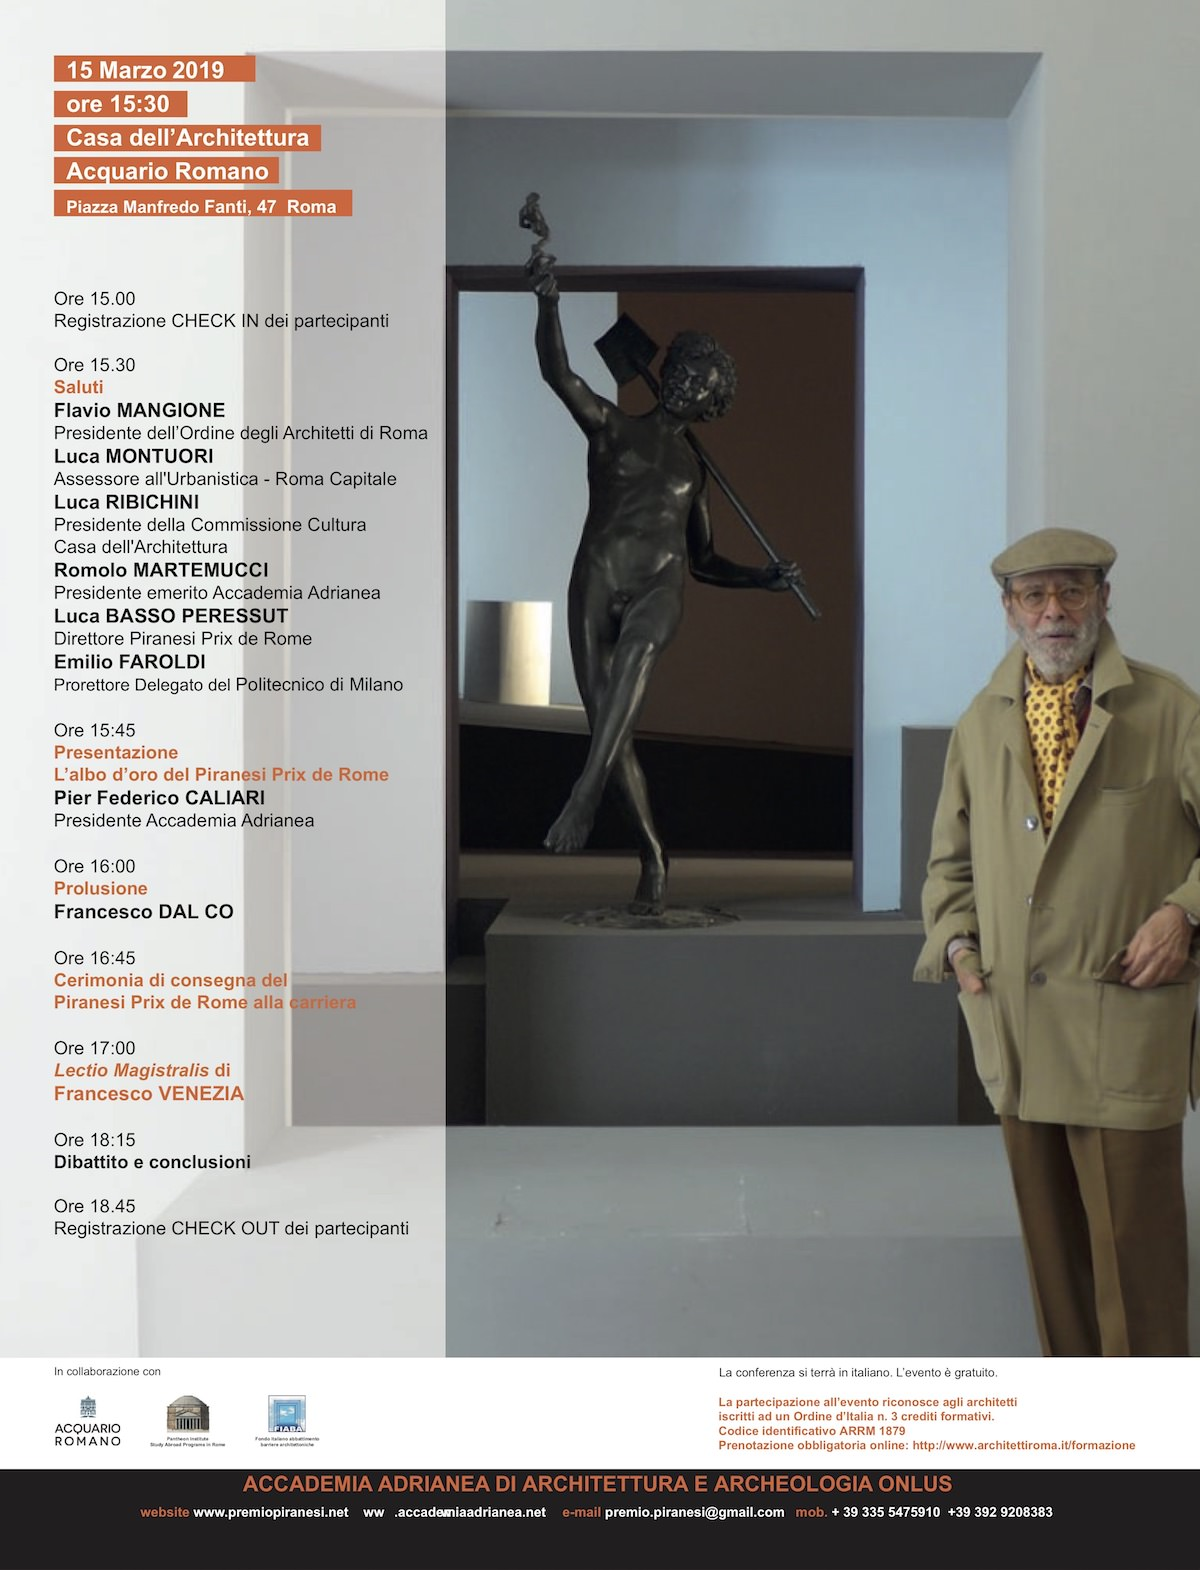 Francesco Venezia Piranesi Prix de Rome